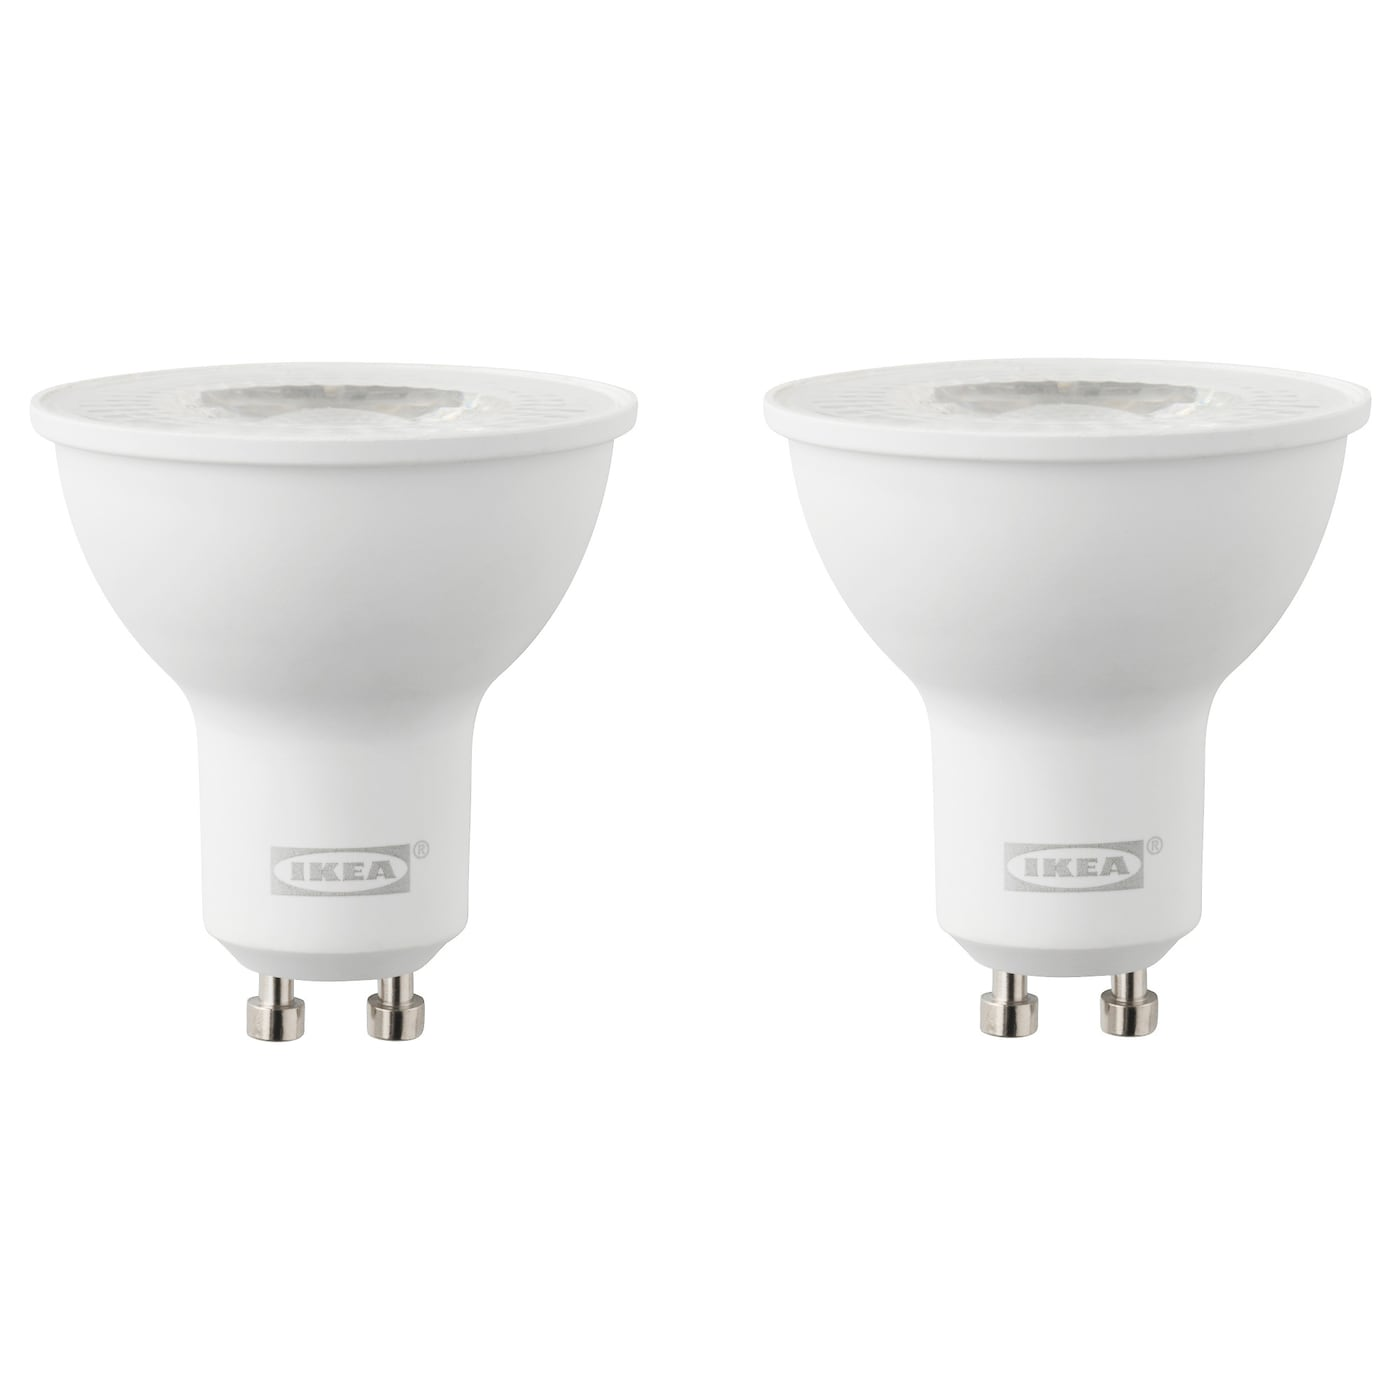 ryet-led-bulb-gu10-400-lumen__0502971_pe632375_s5 Wunderbar Led Gu 10 Dekorationen